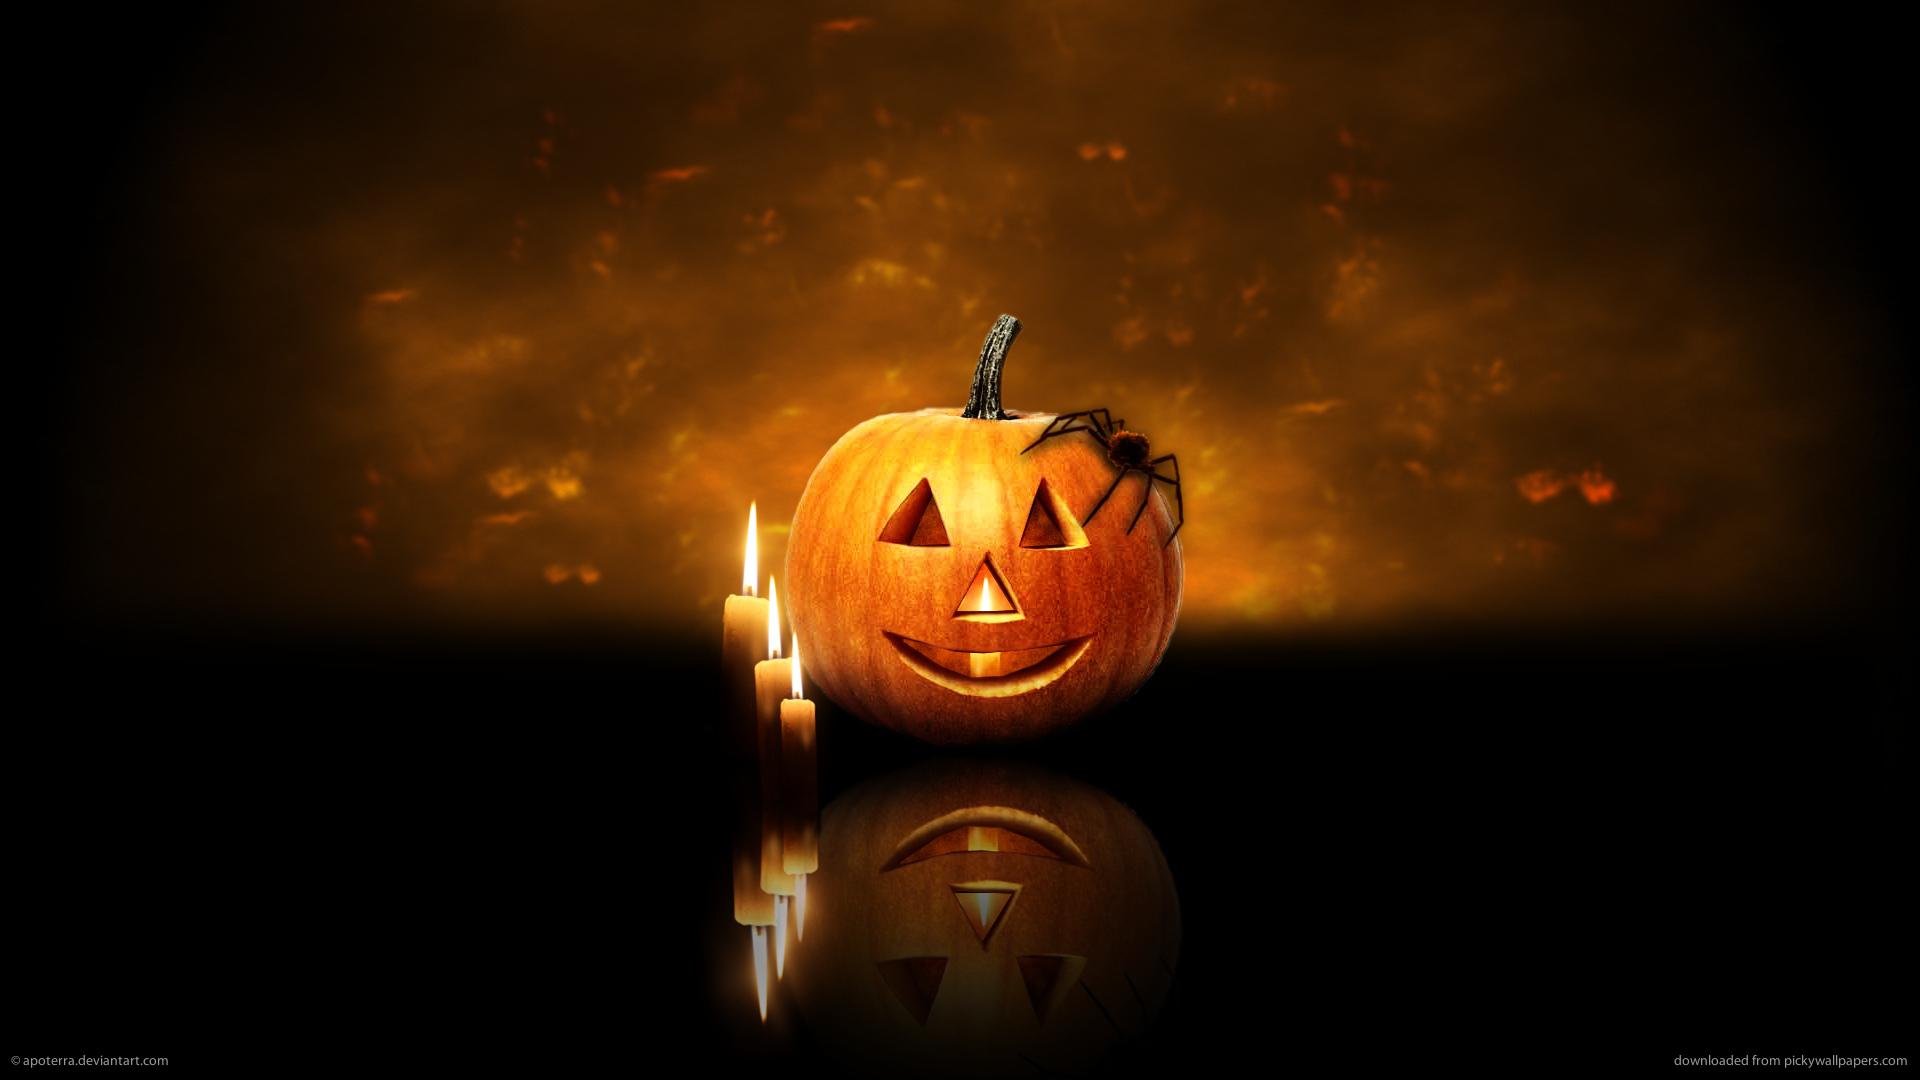 Download. Description wallpaper: Halloween Screensavers ...